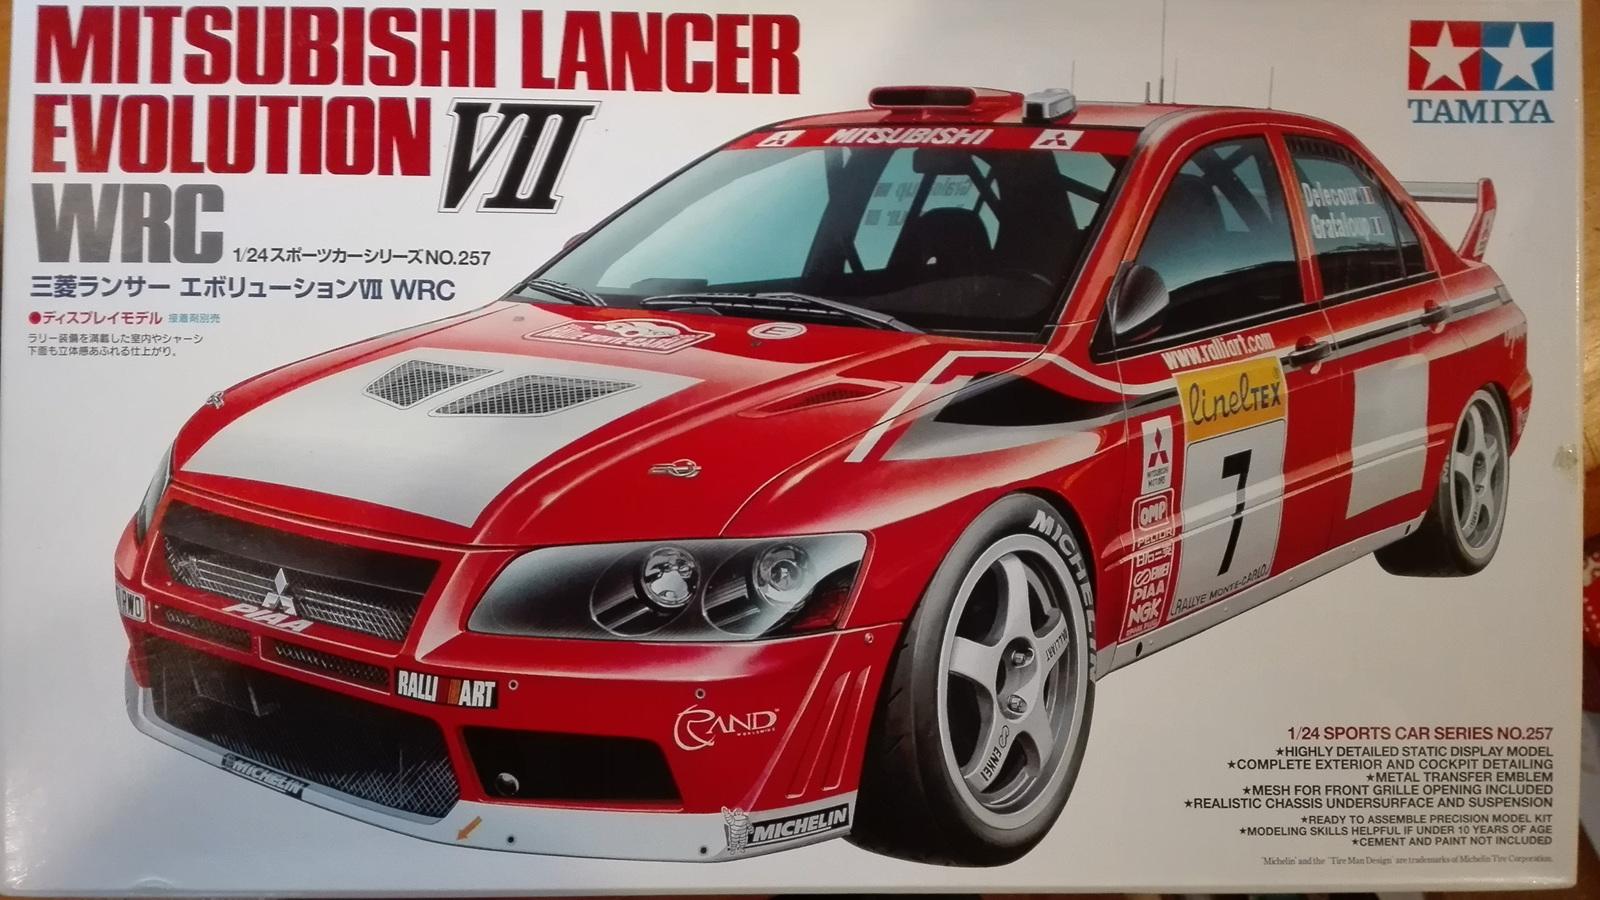 Tamiya 1/24 Mitsubishi Lancer Evo VII WRC - Rick's Model Kits